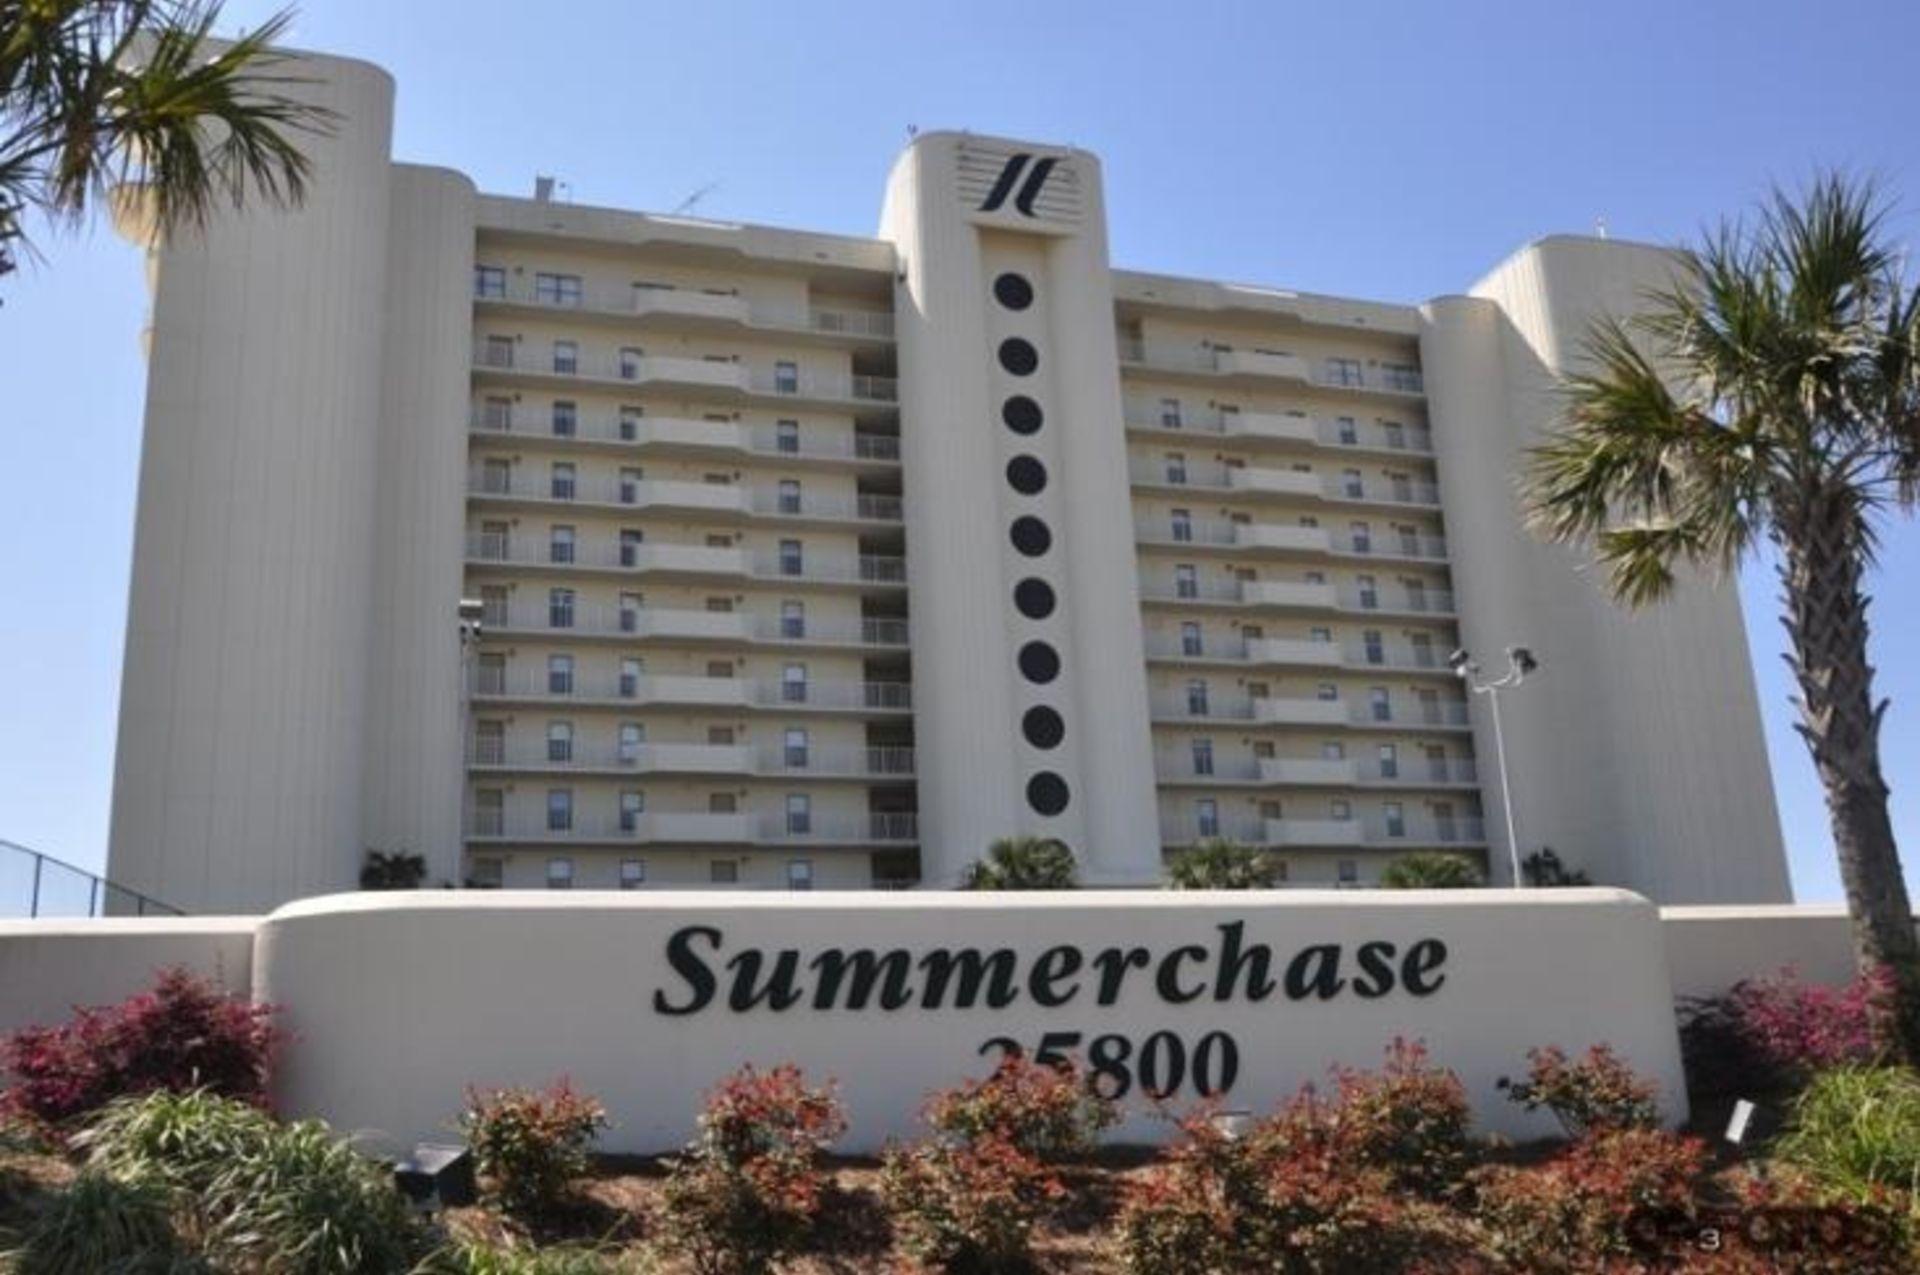 Orange Beach Condos from $400,000 to $500,000